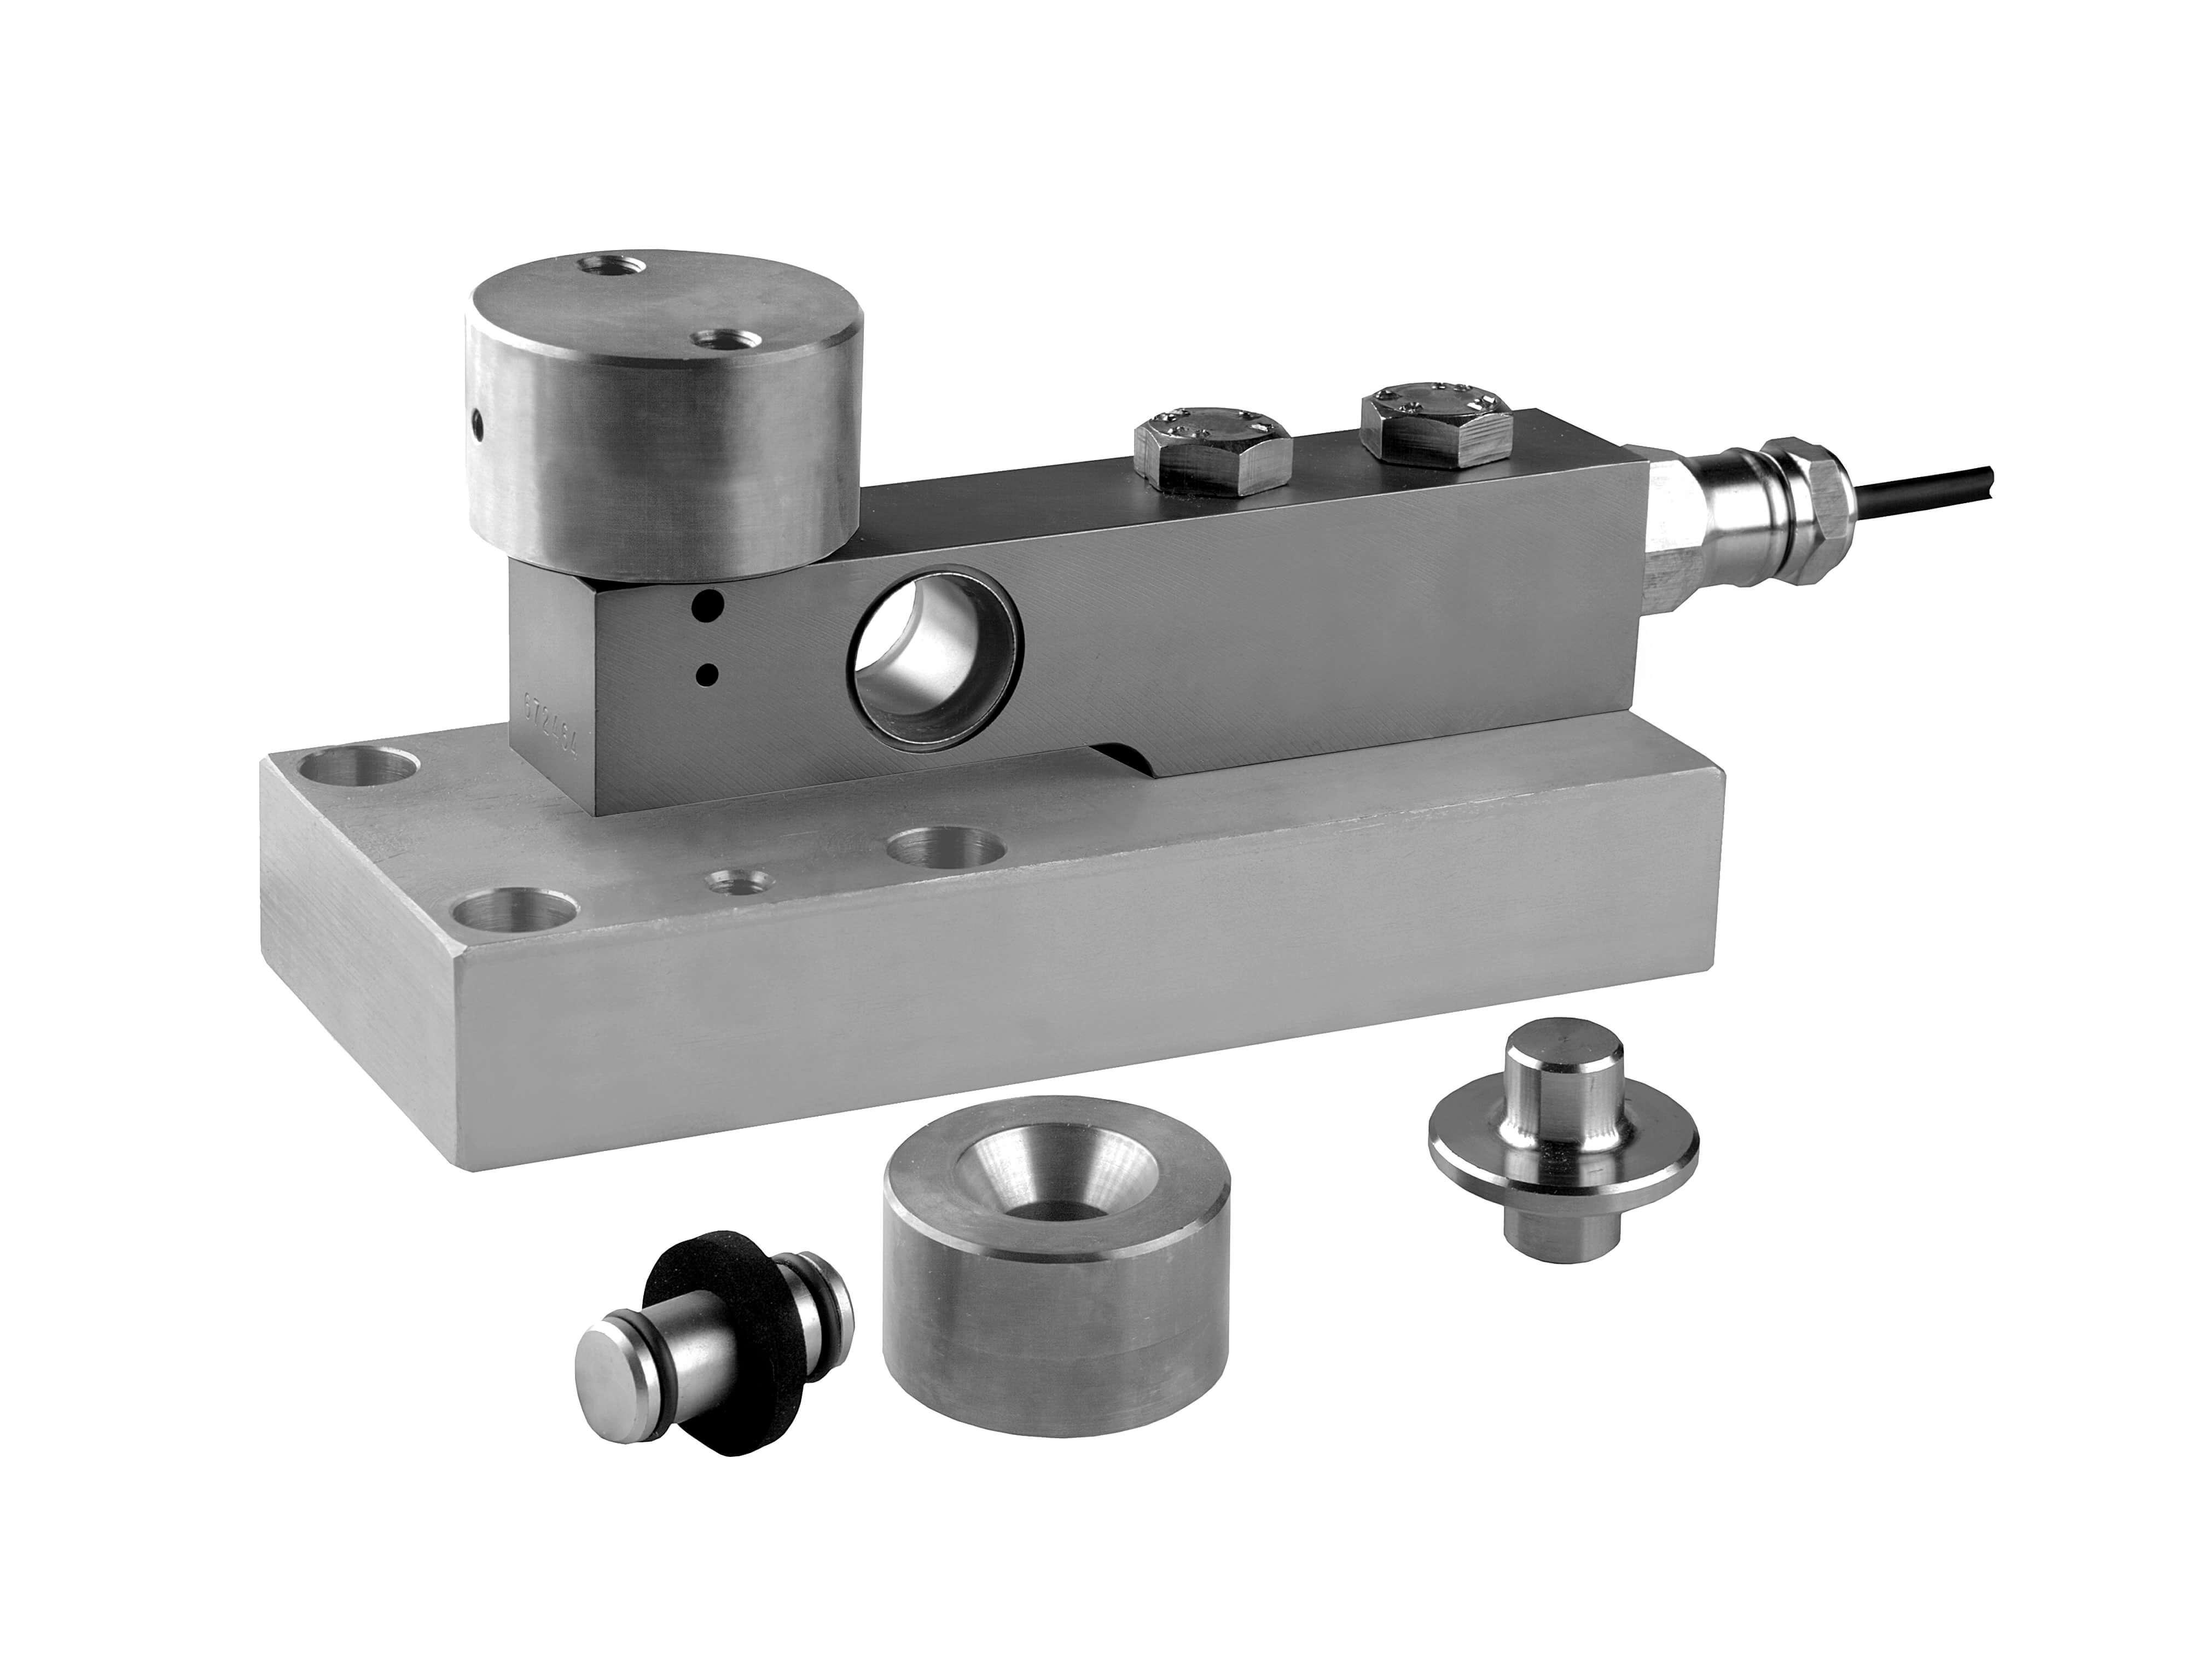 52-08 rocker pin (geschikt voor SB4, SB5, SLB, SB9, SB14) Image